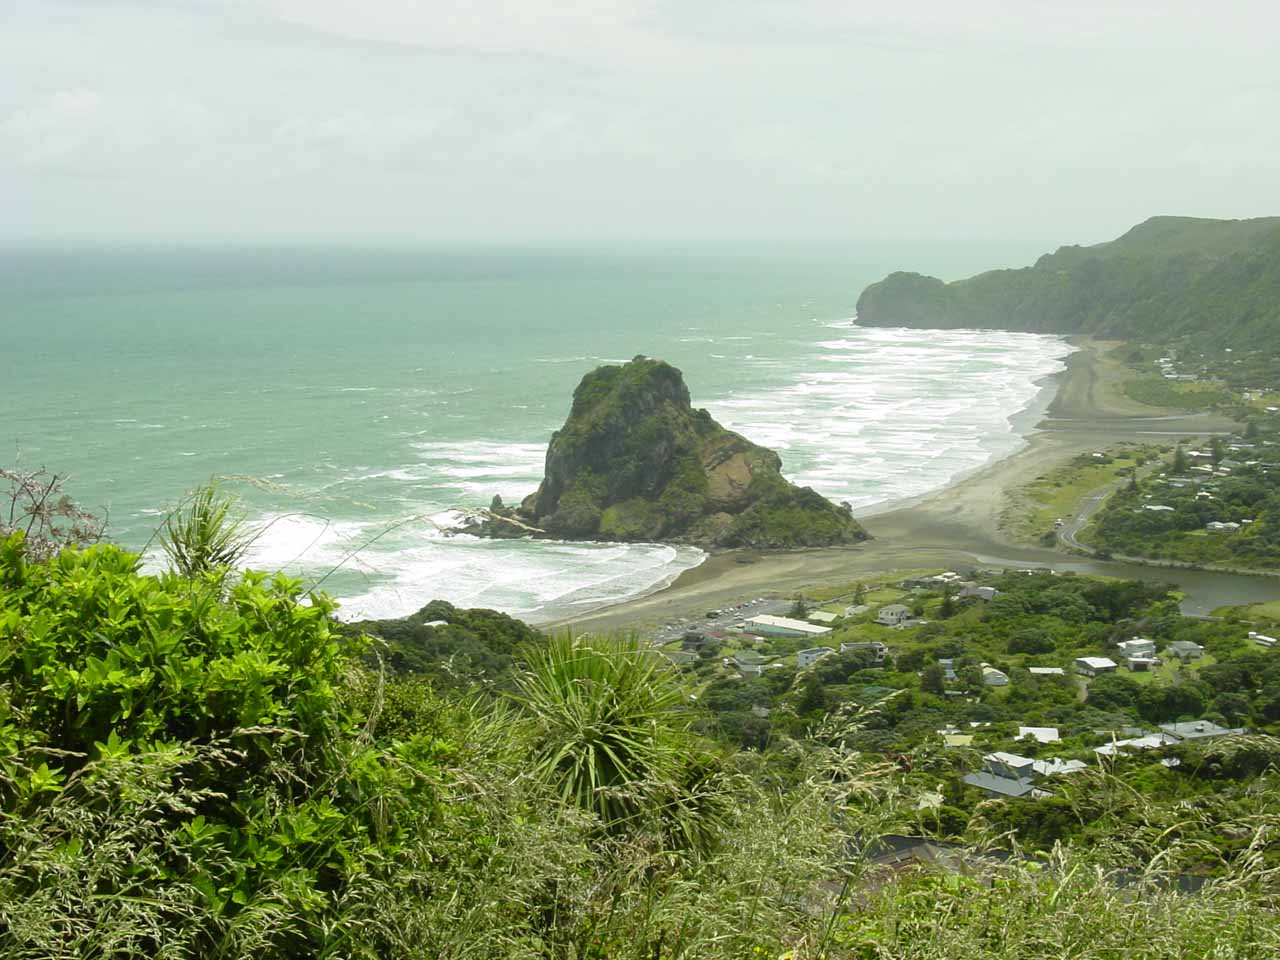 Between Kitekite Falls and Karekare Falls was this gorgeous view of Lion's Rock and Piha Beach on Piha Rd